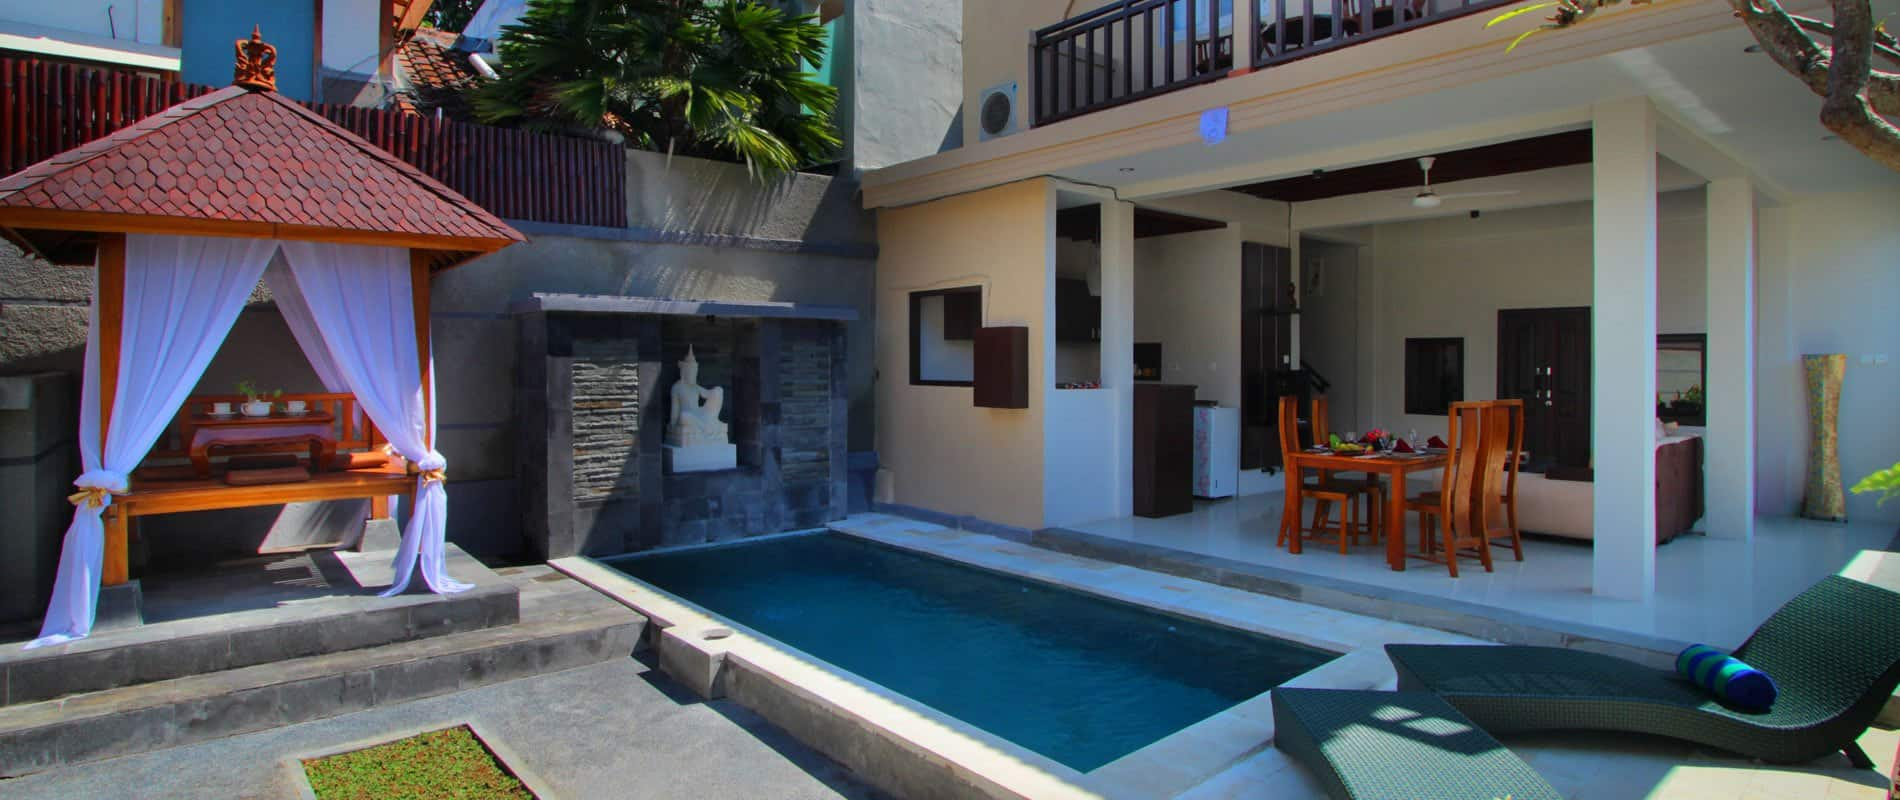 Muslim friendly honeymoon villas for all budgets in bali - Villas en bali ...